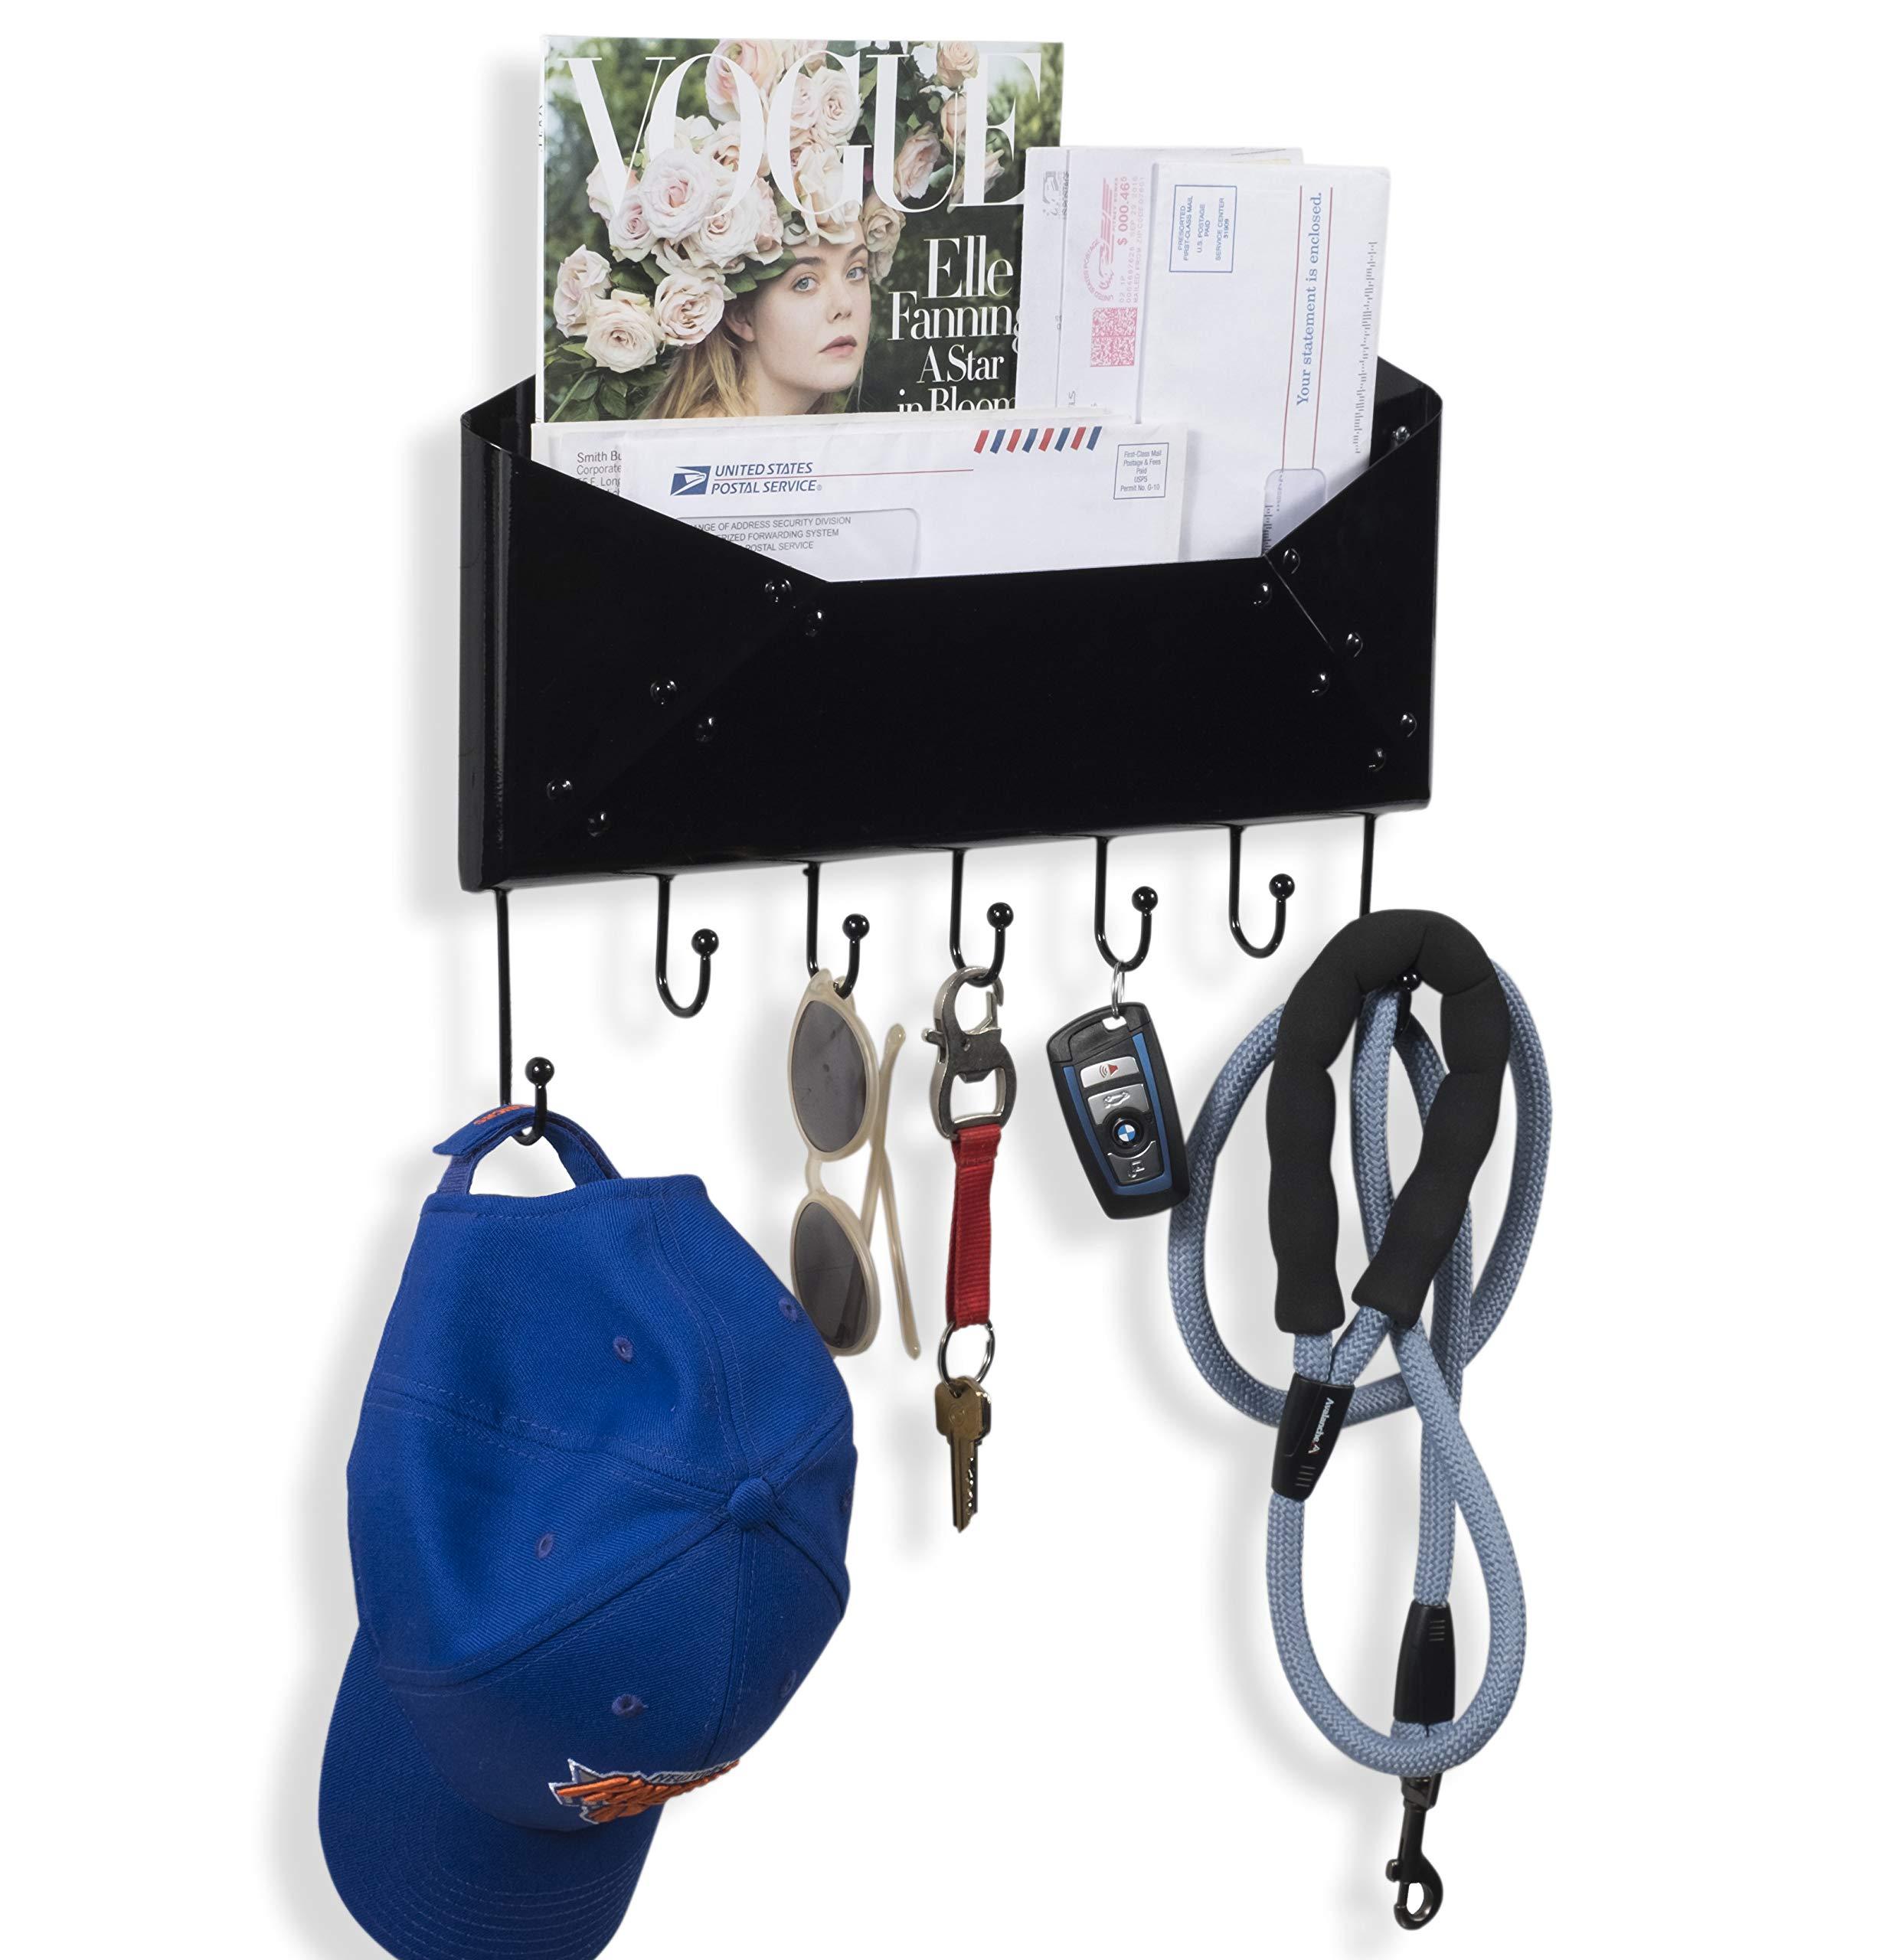 Wallniture Set of 2 Vesti Entryway Organizer – Wall Mounted Metal Mail Sorter – Magazine Holder with Hooks Black